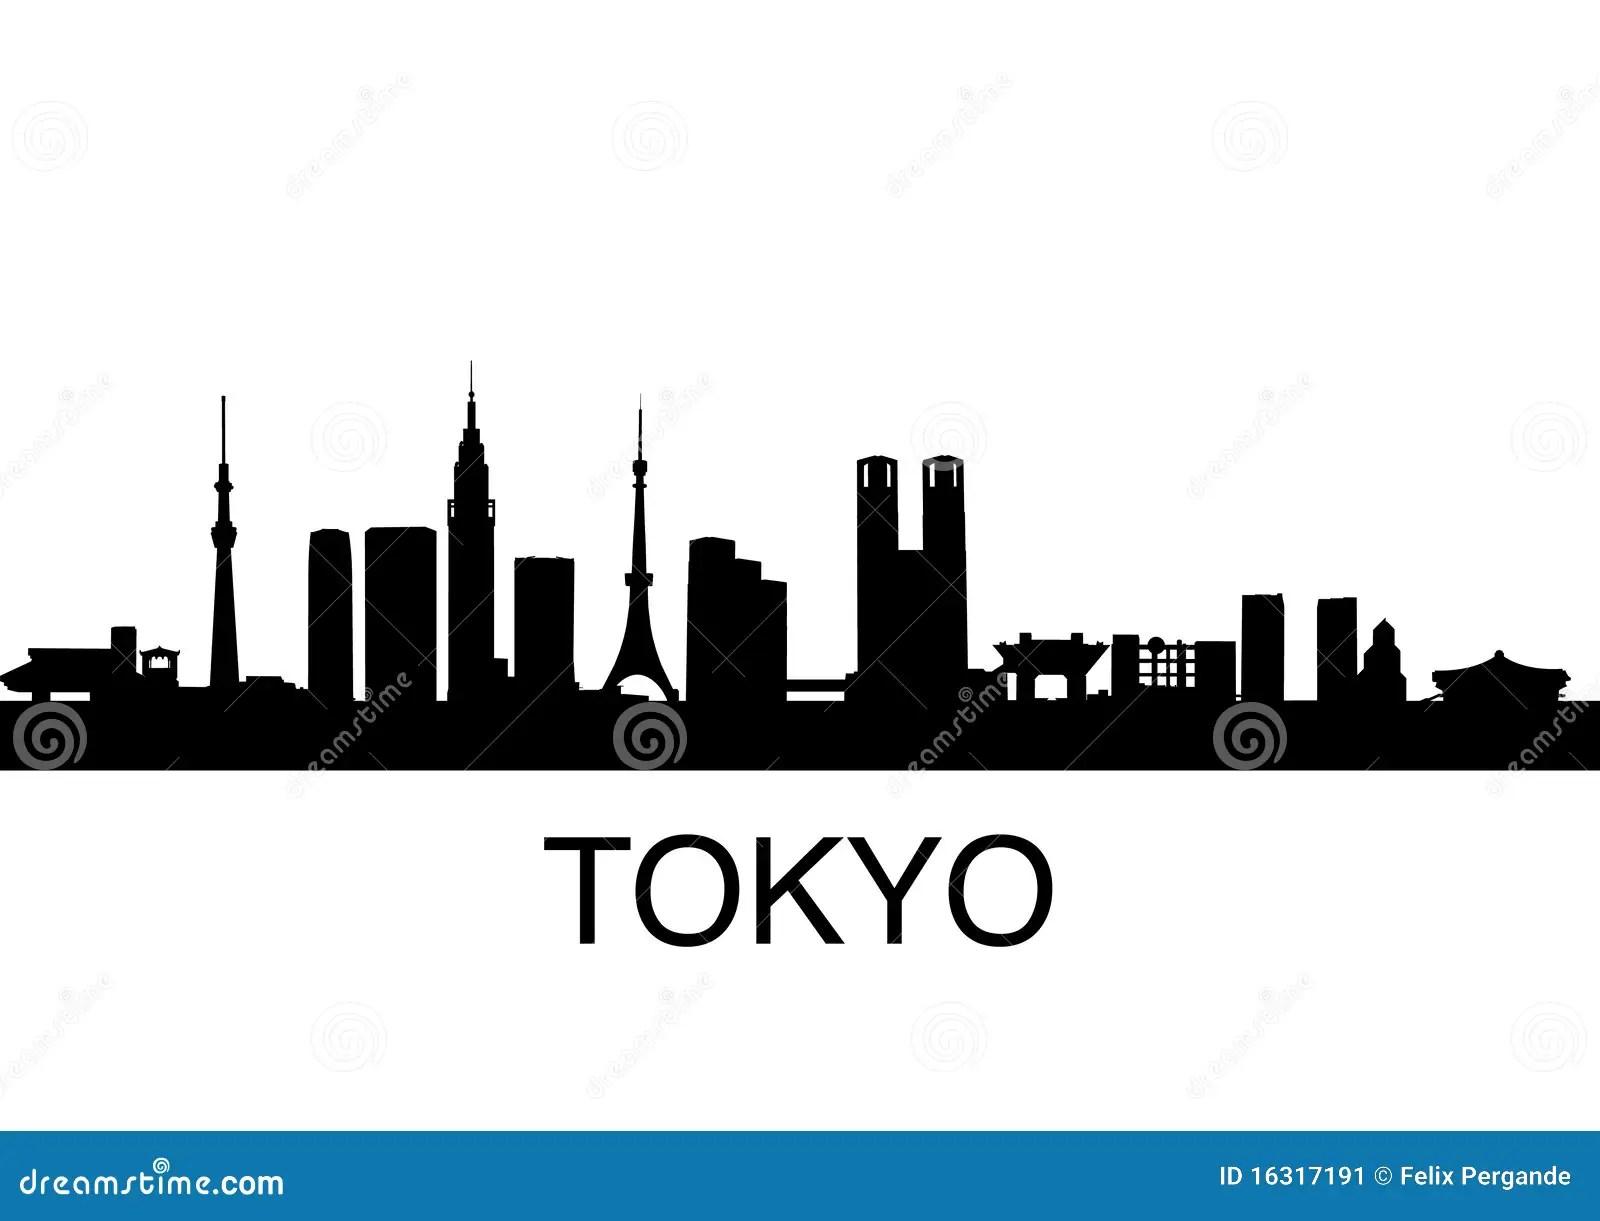 Skyline Car Wallpaper Hd Tokyo Skyline Stock Vector Illustration Of Japanese